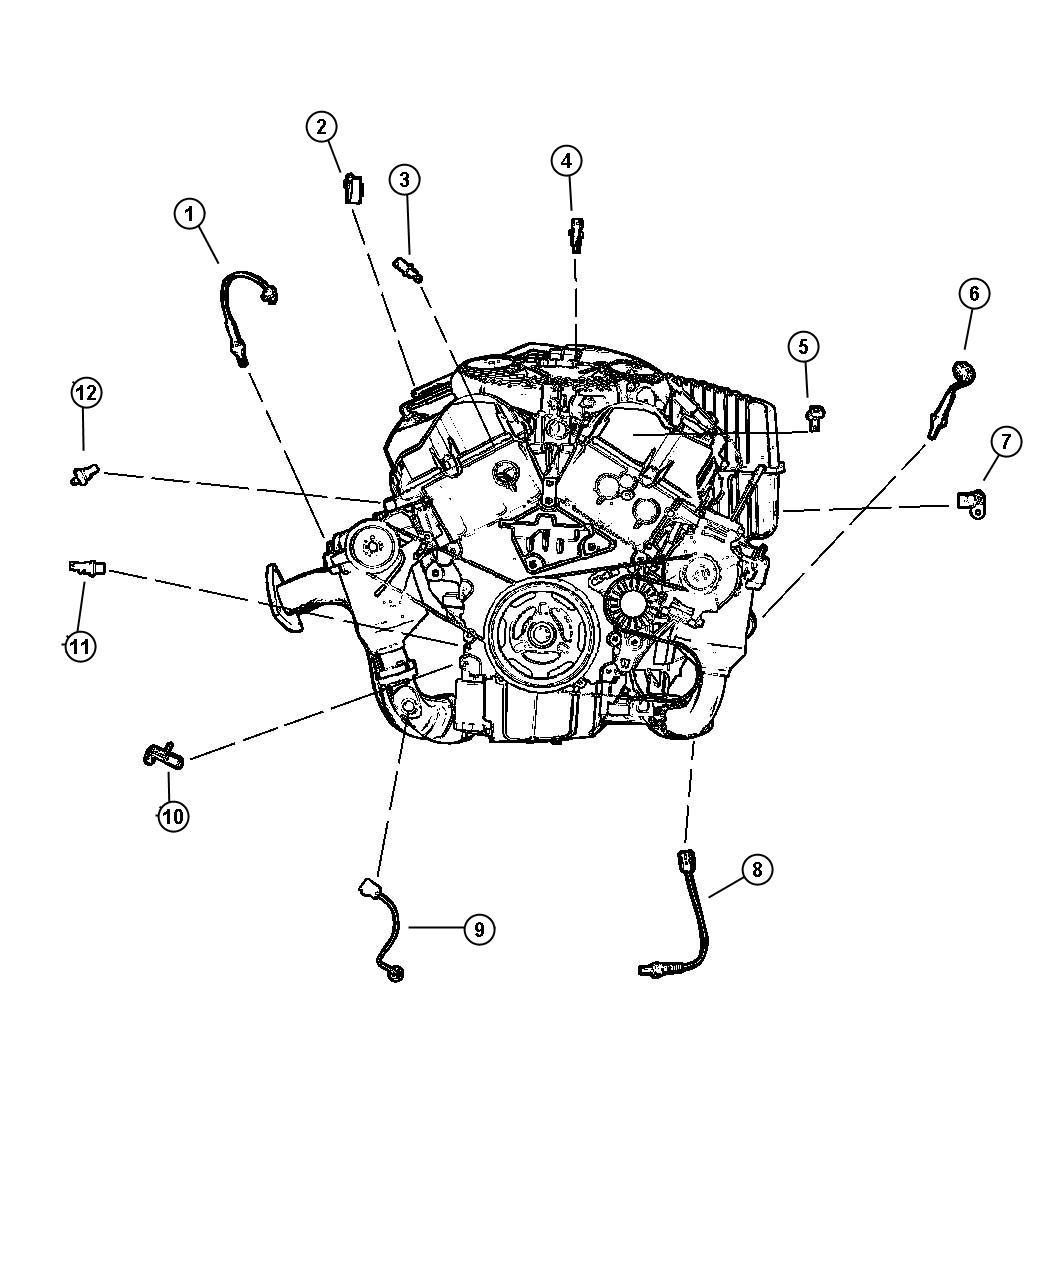 Dodge Intrepid Sensor Detonation Wactive Ees